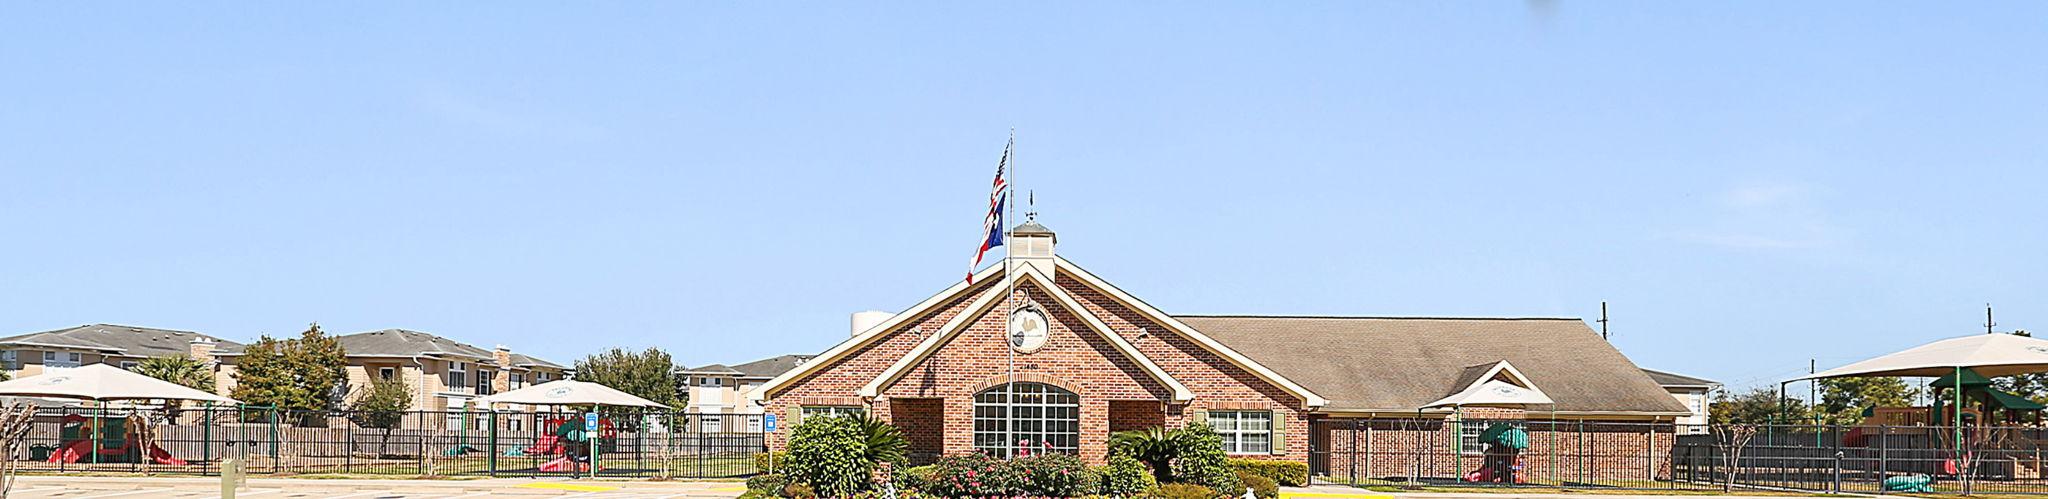 Exterior of a Primrose School of North Mason Creek